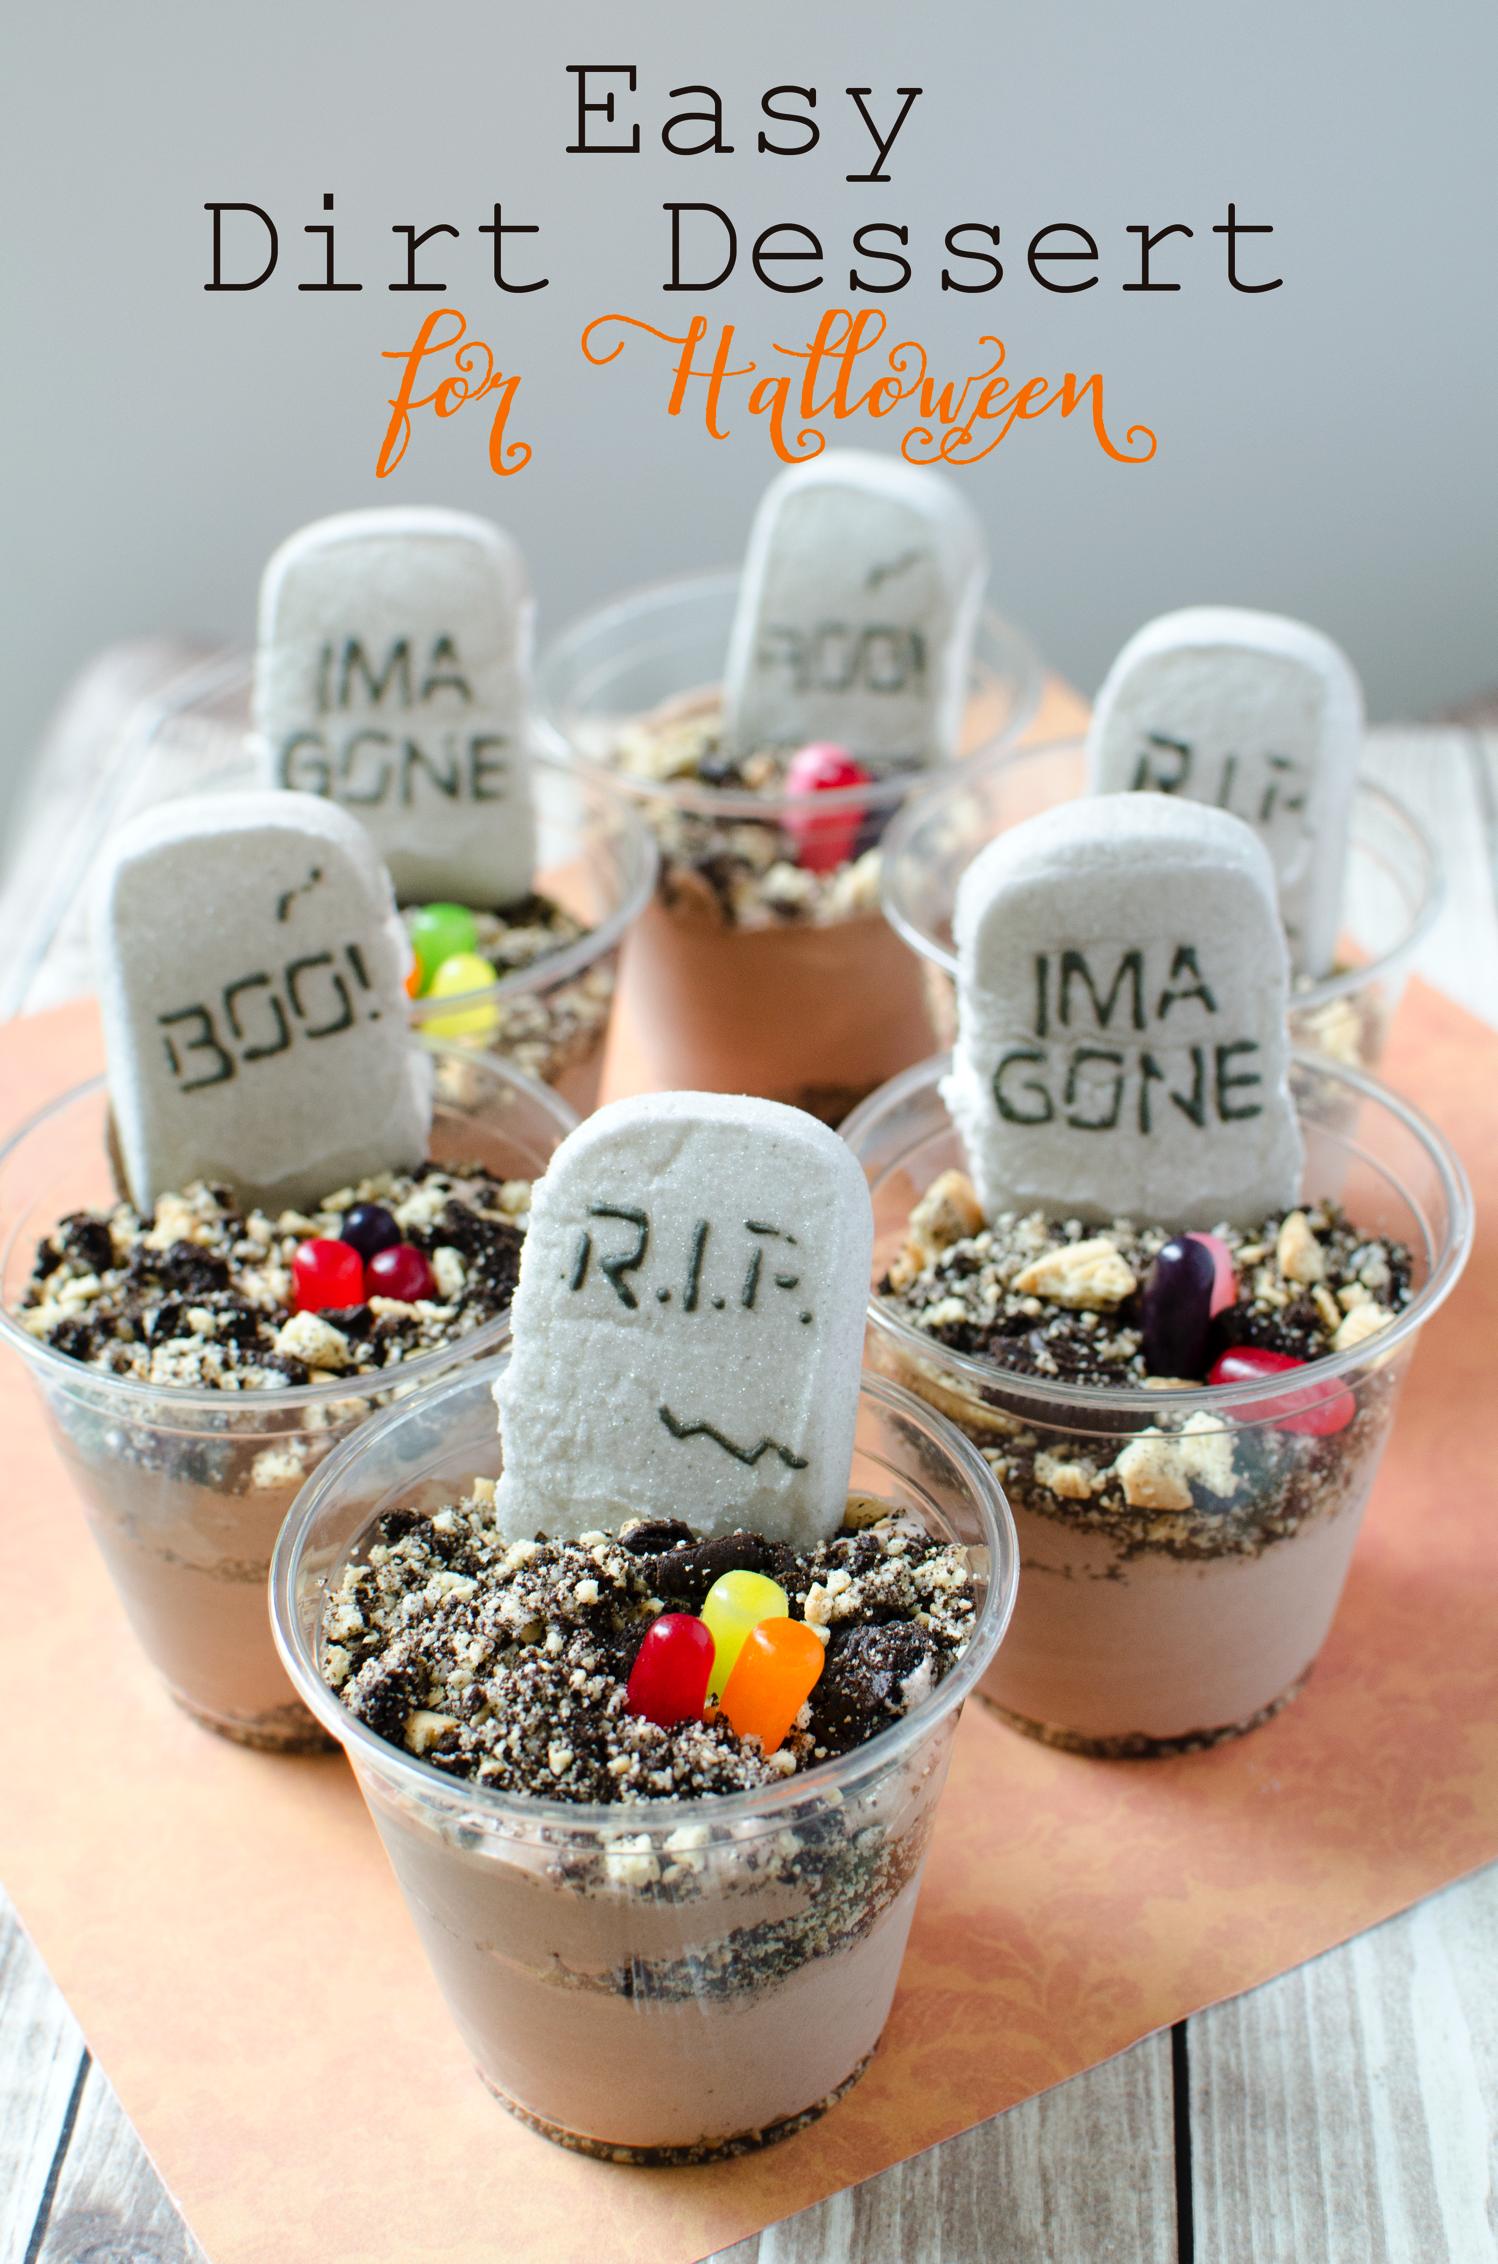 Easy Dirt Dessert Recipe for Halloween Halloween Food